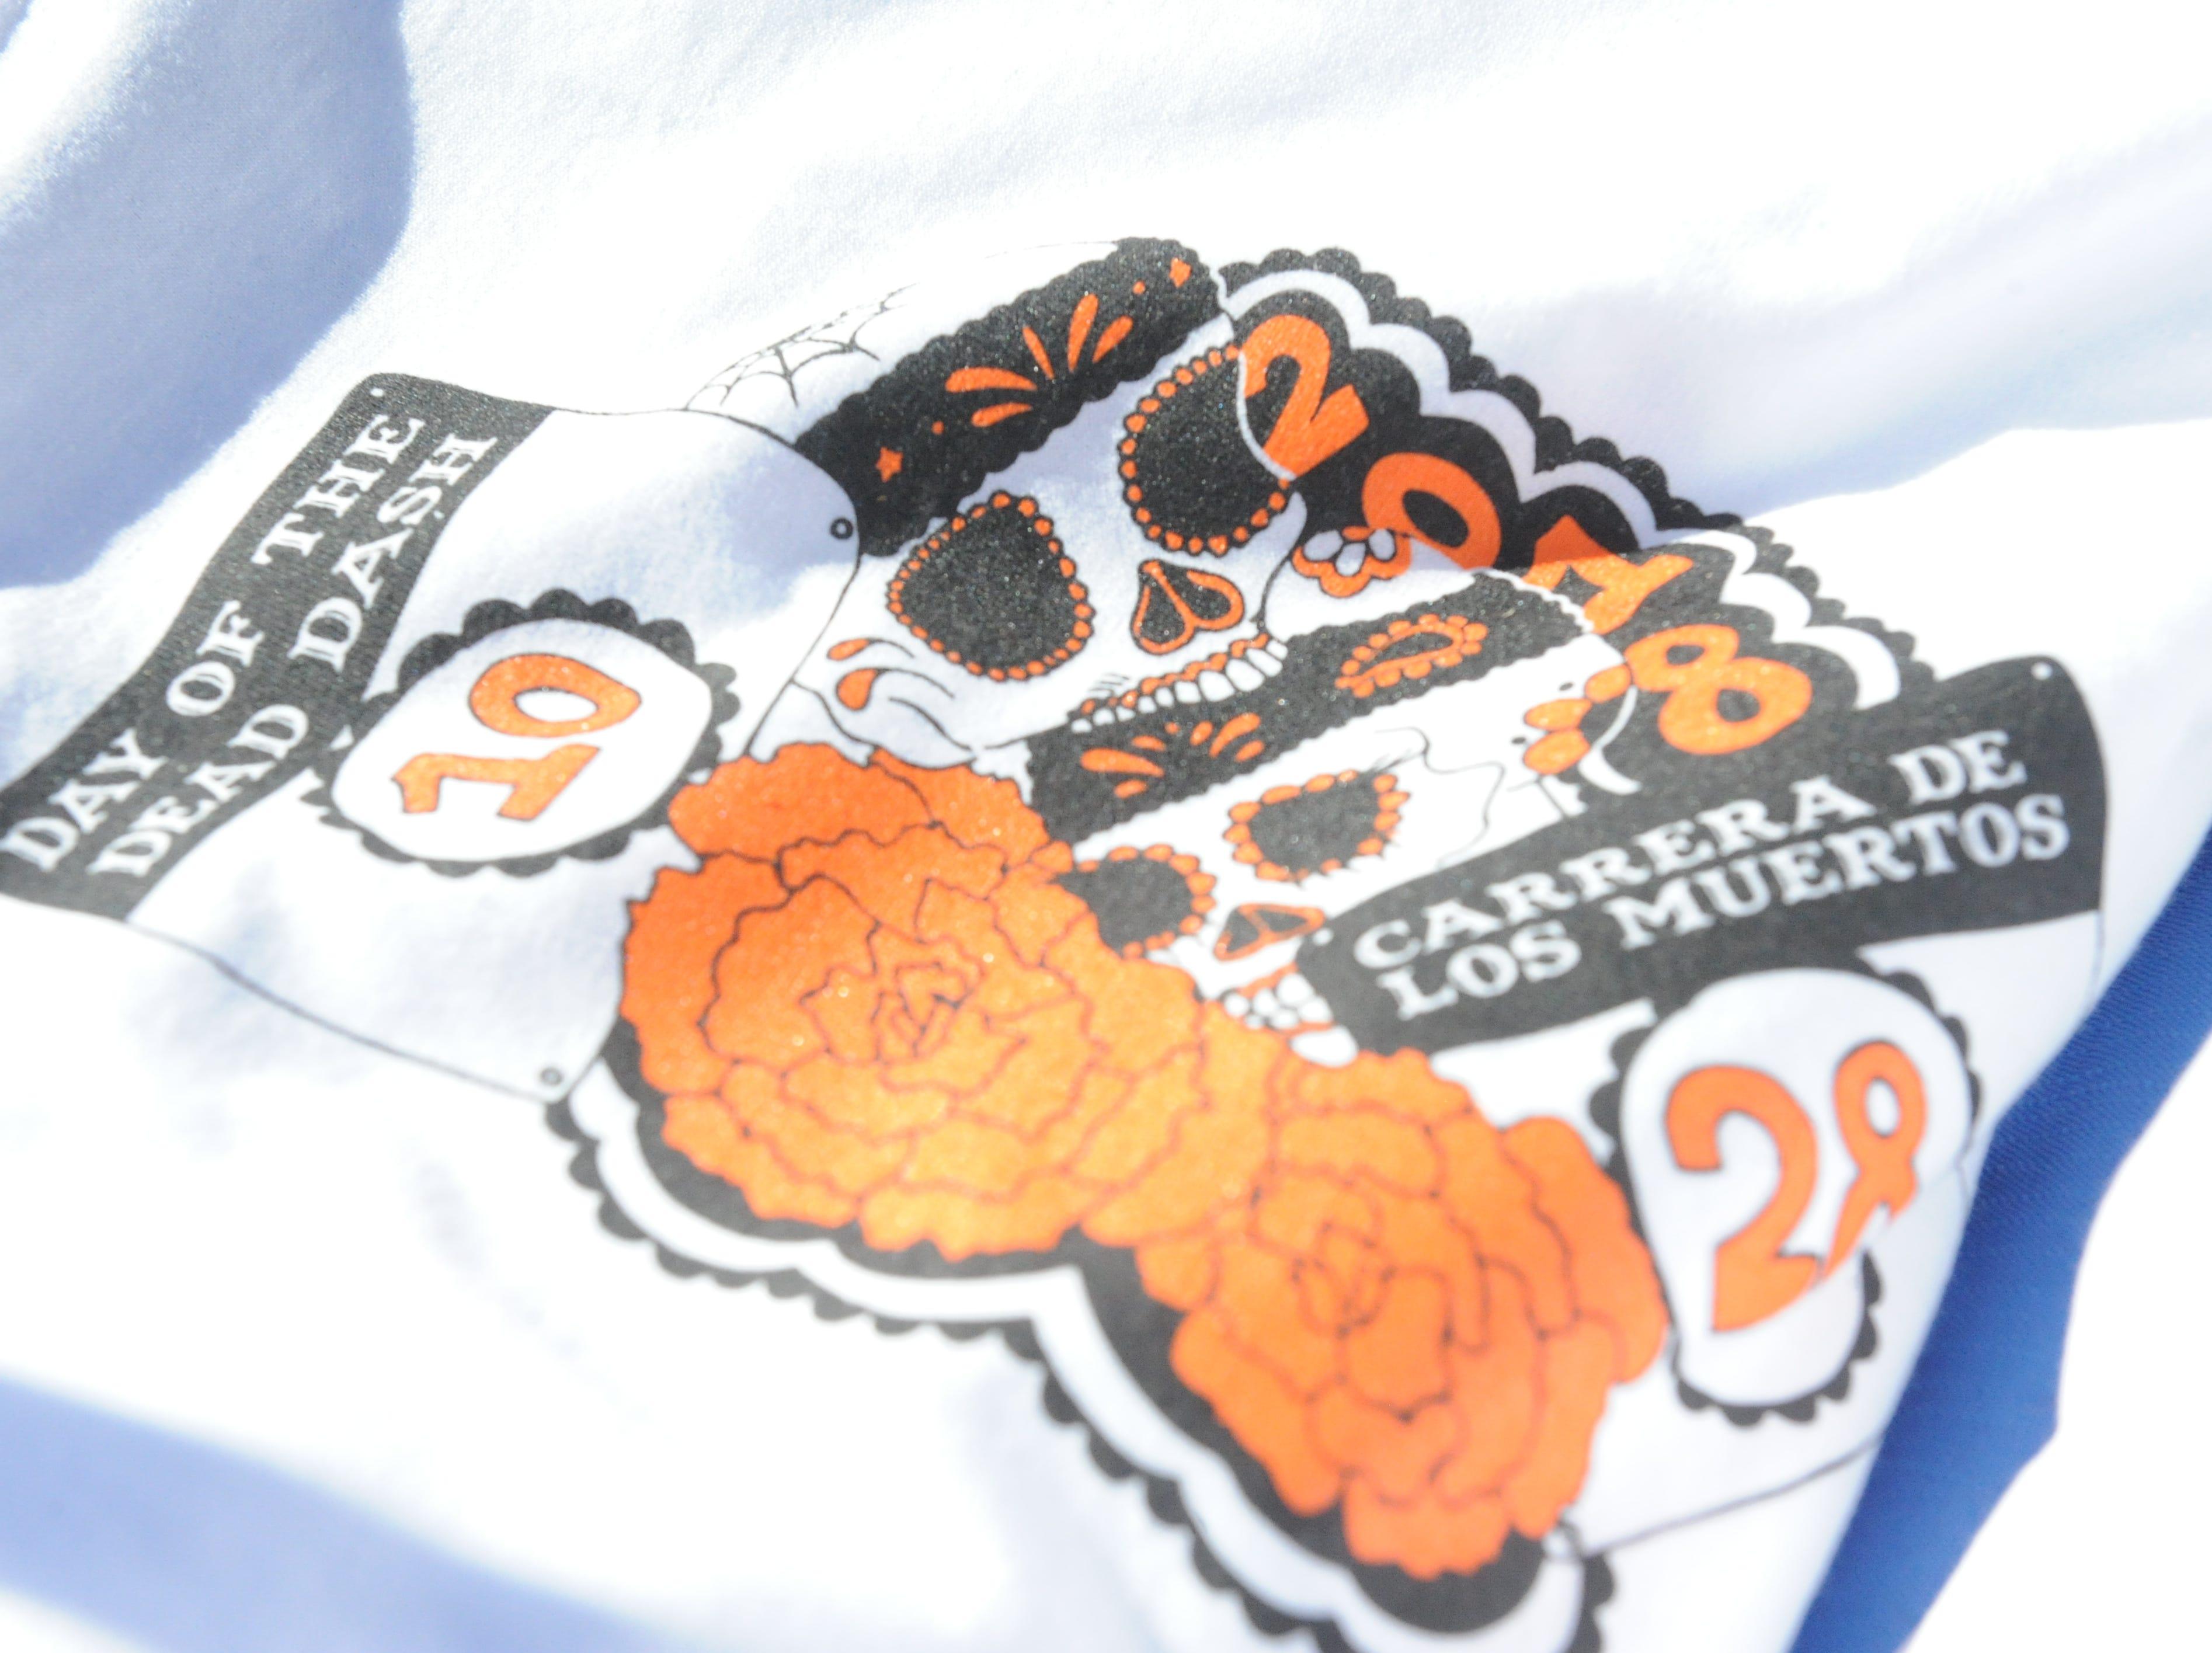 The event t-shirt for the Día de los Muertos 5k run.